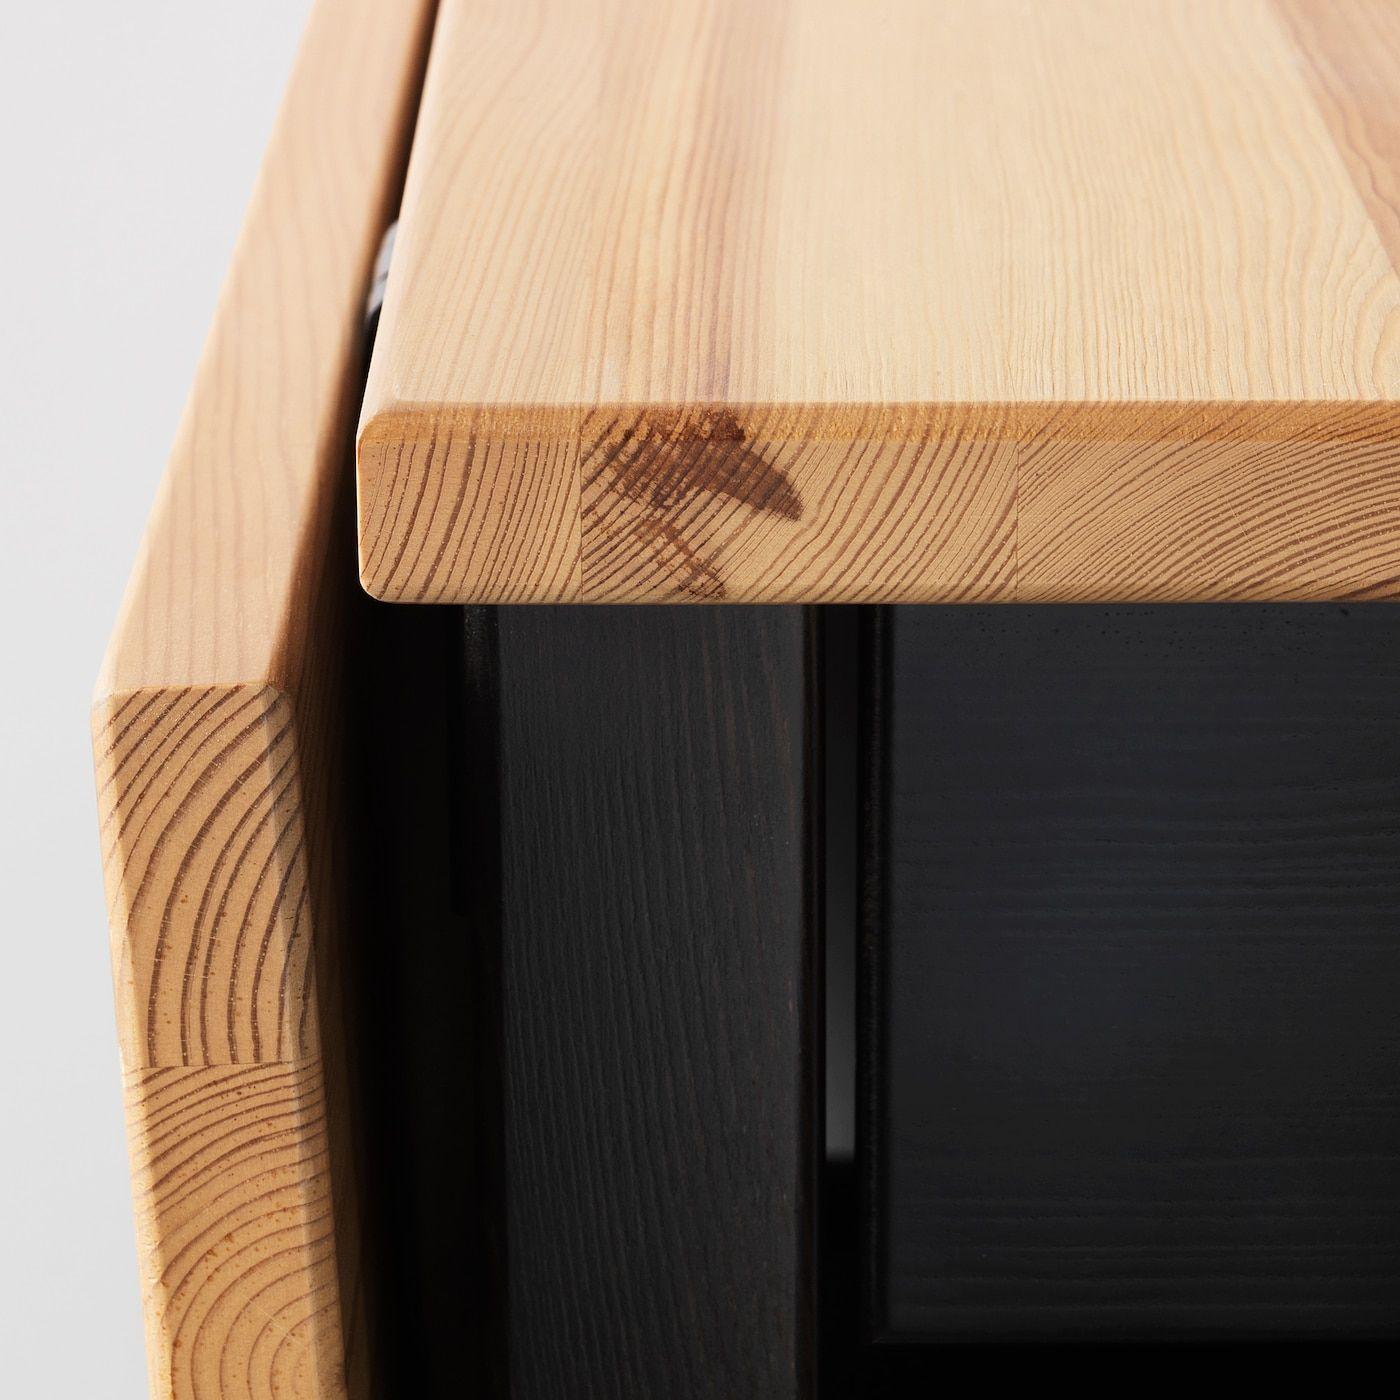 Arkelstorp Coffee Table Black Ikea Ikea Coffee Table Wood Drawers [ 1400 x 1400 Pixel ]